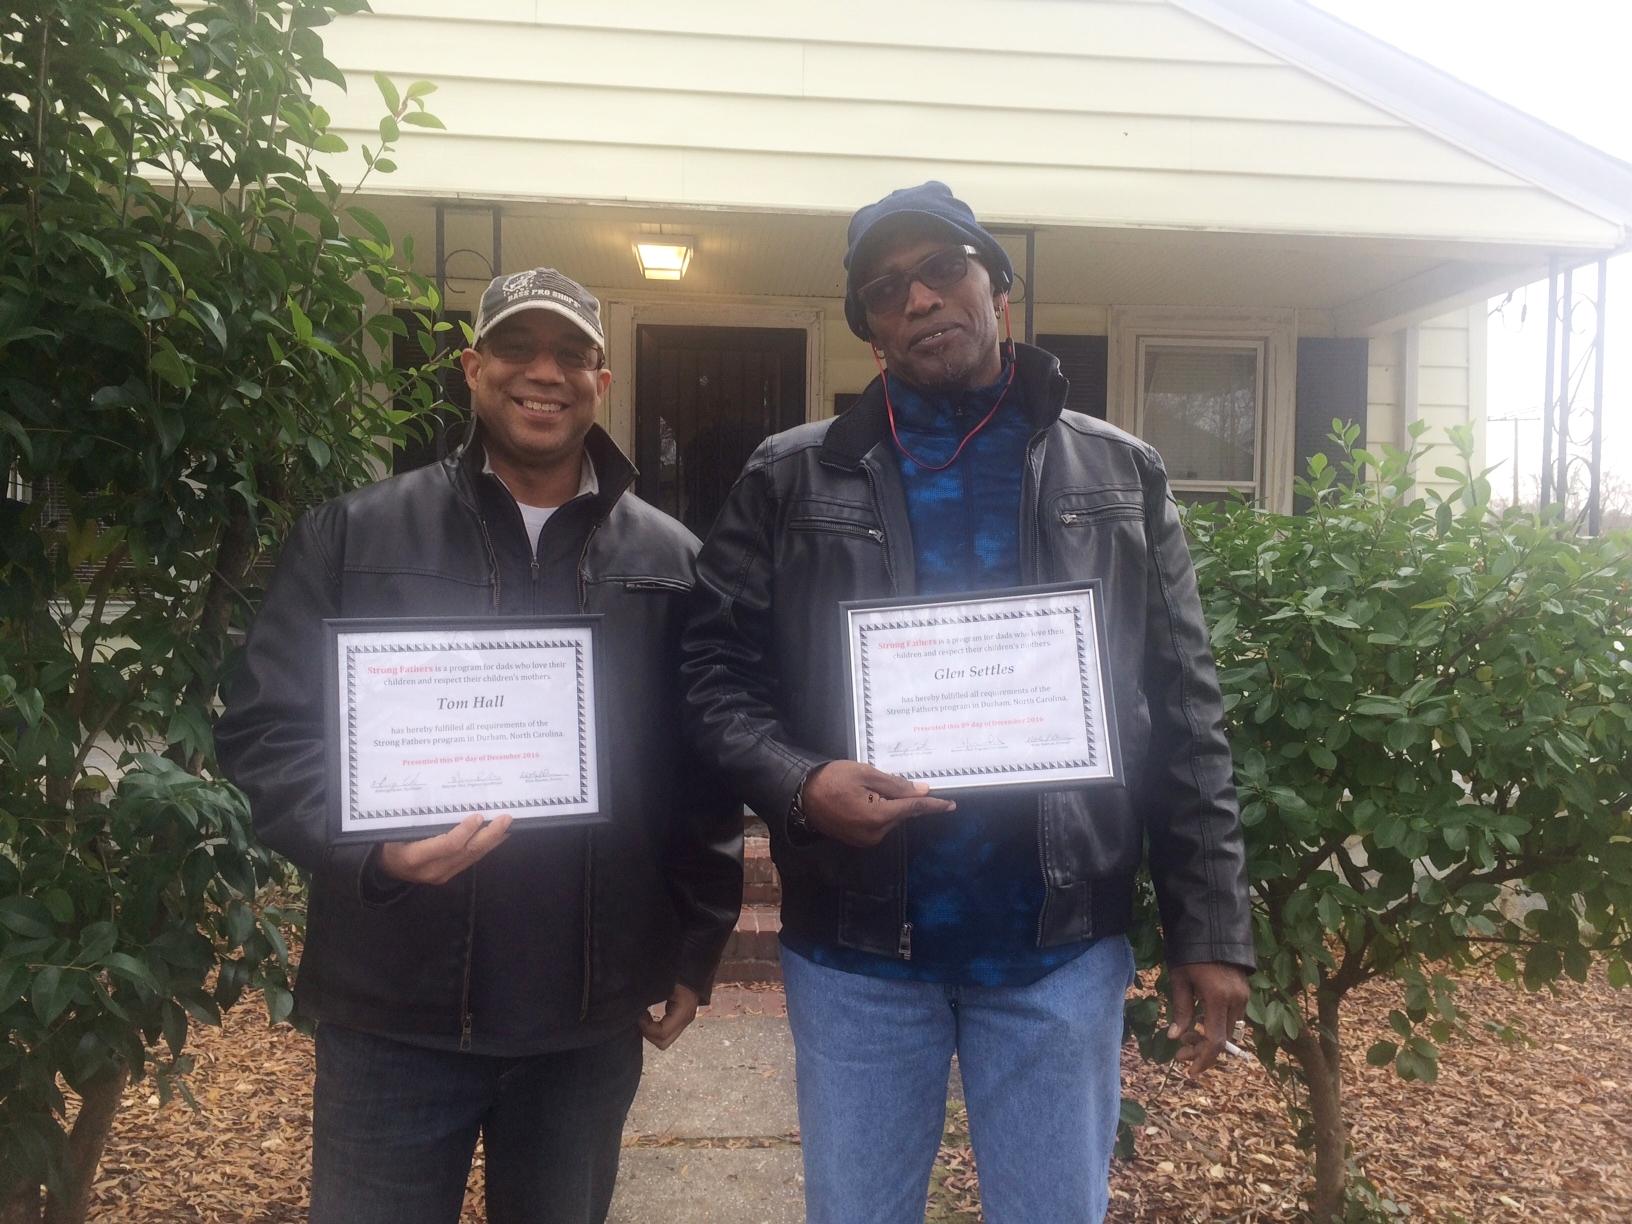 Two proud grads